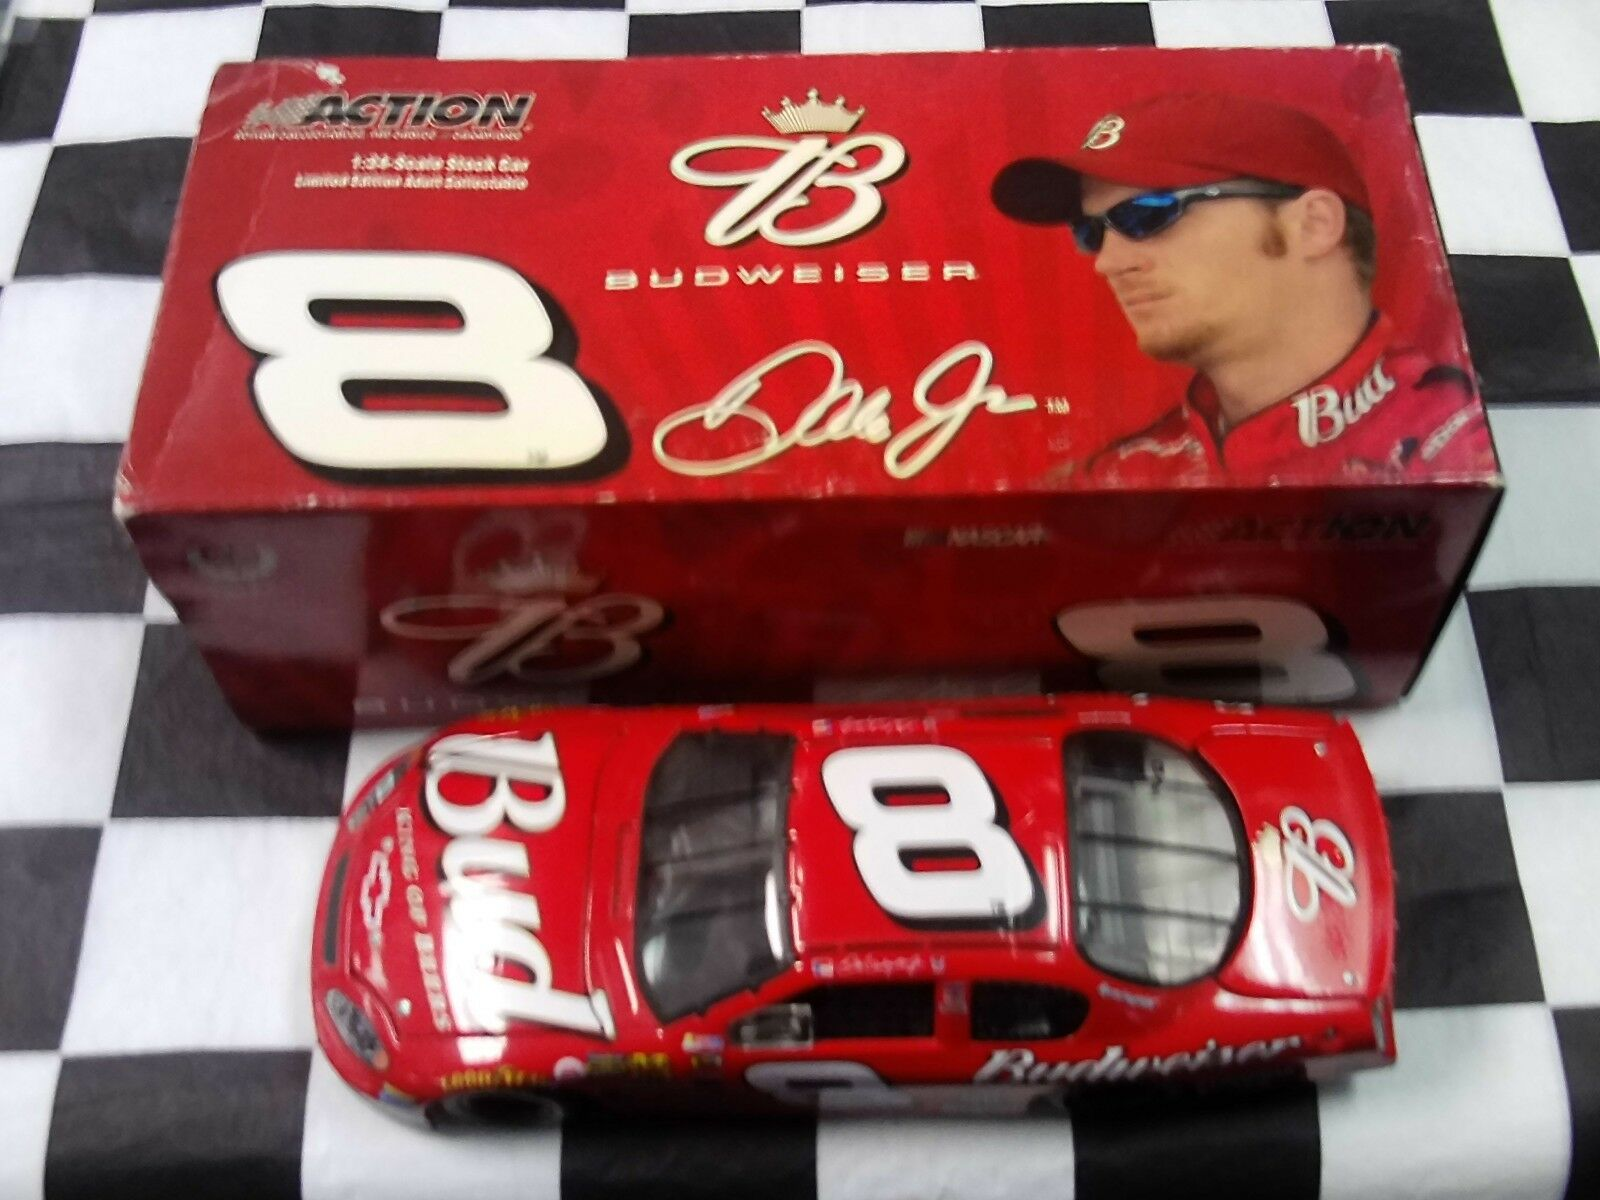 Dale Earnhardt Jr  8 Budweiser 2004 MONTE CARLO 1 24 Action Neuf dans sa boîte GM Dealer 105989